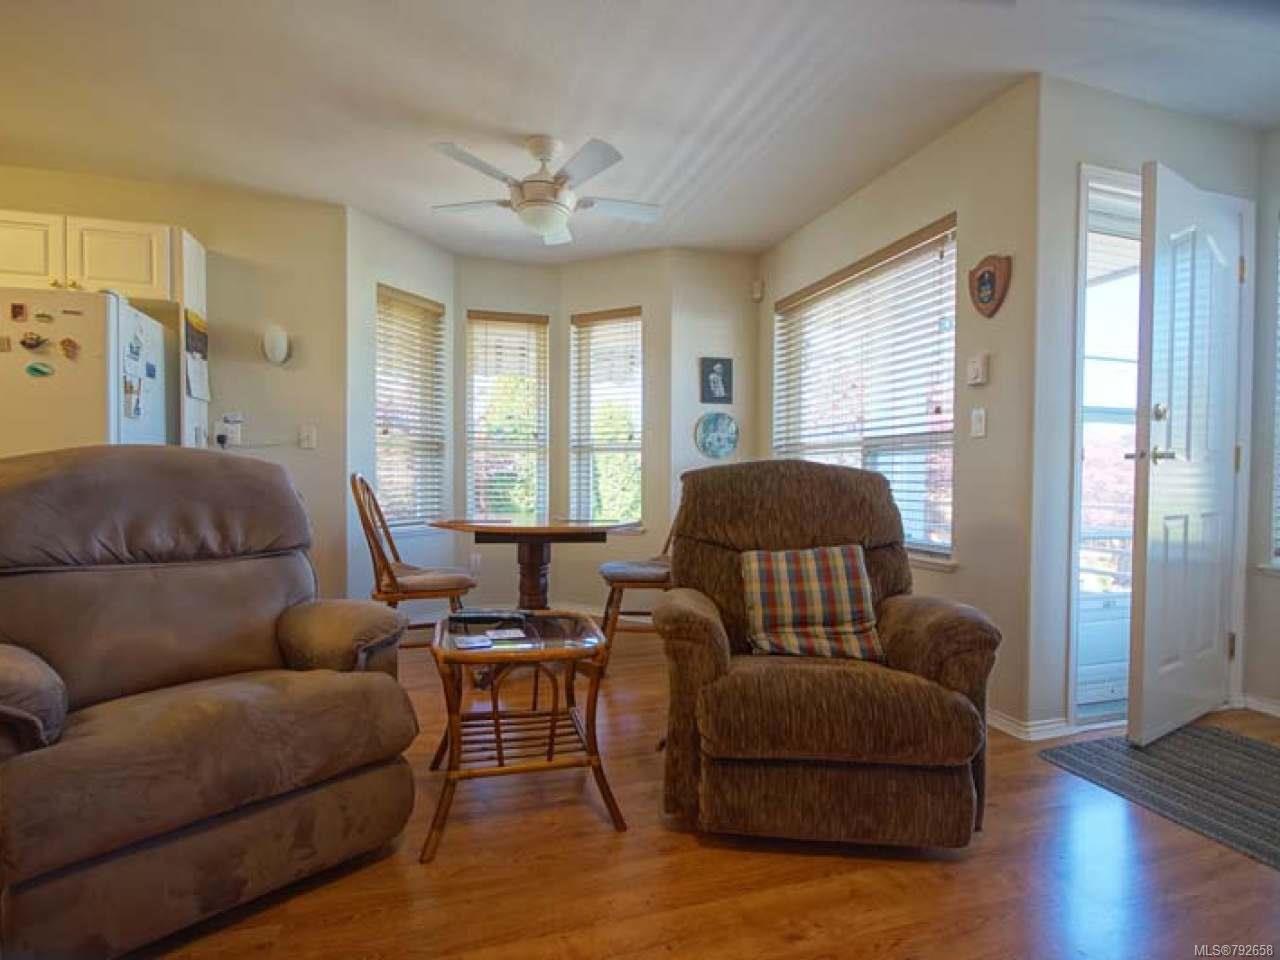 Photo 15: Photos: 893 EDGEWARE Avenue in PARKSVILLE: PQ Parksville House for sale (Parksville/Qualicum)  : MLS®# 792658